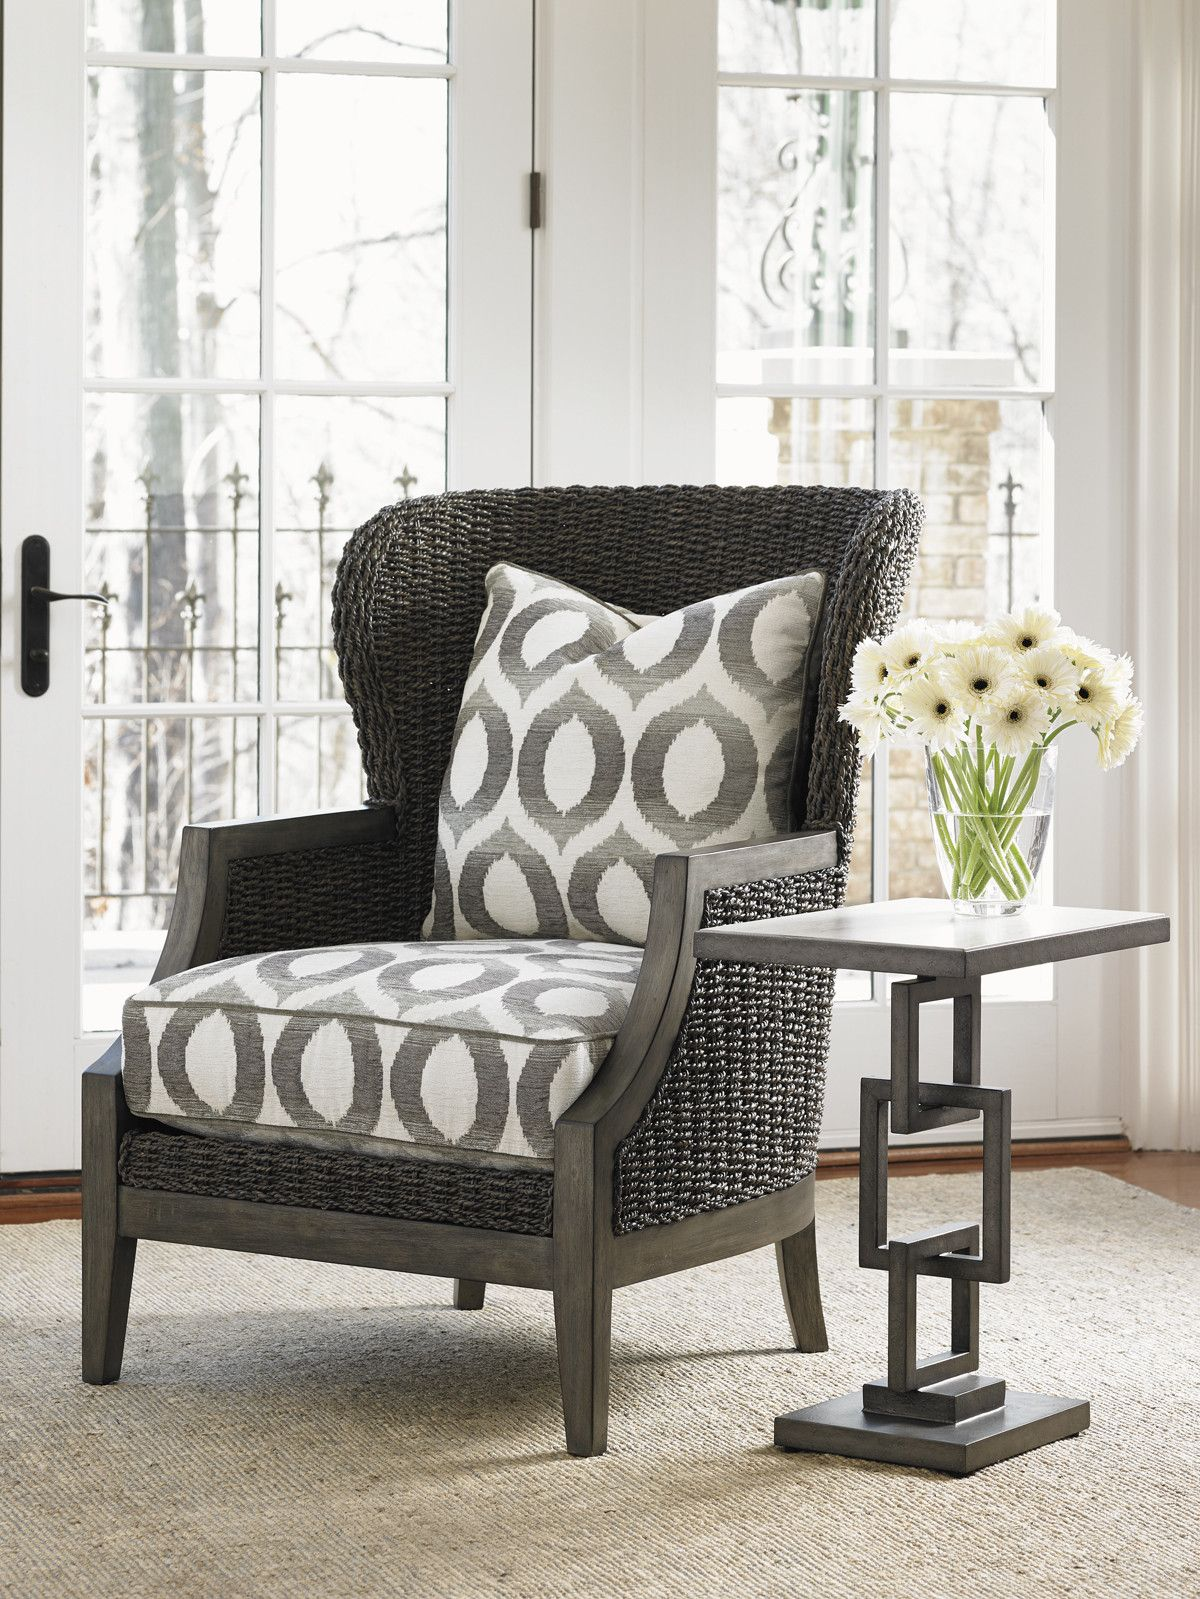 Deerwood Rectangular Side Table Lexington Home Brands